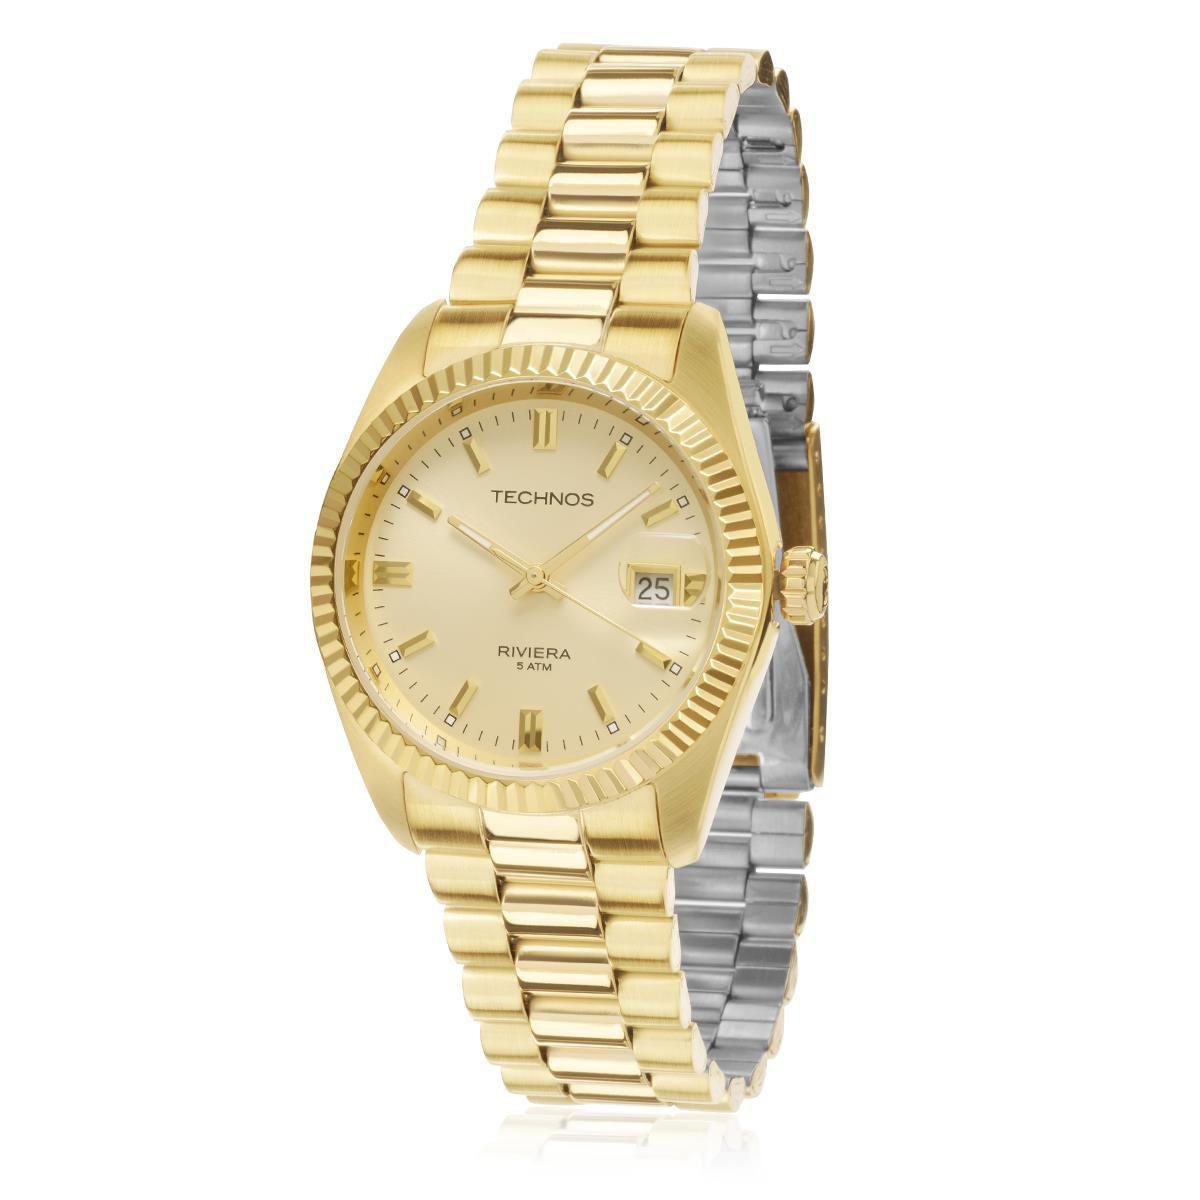 874aae7f4438b Relógio Masculino Technos Riviera 2115EF 4X Dourado - Relógio ...